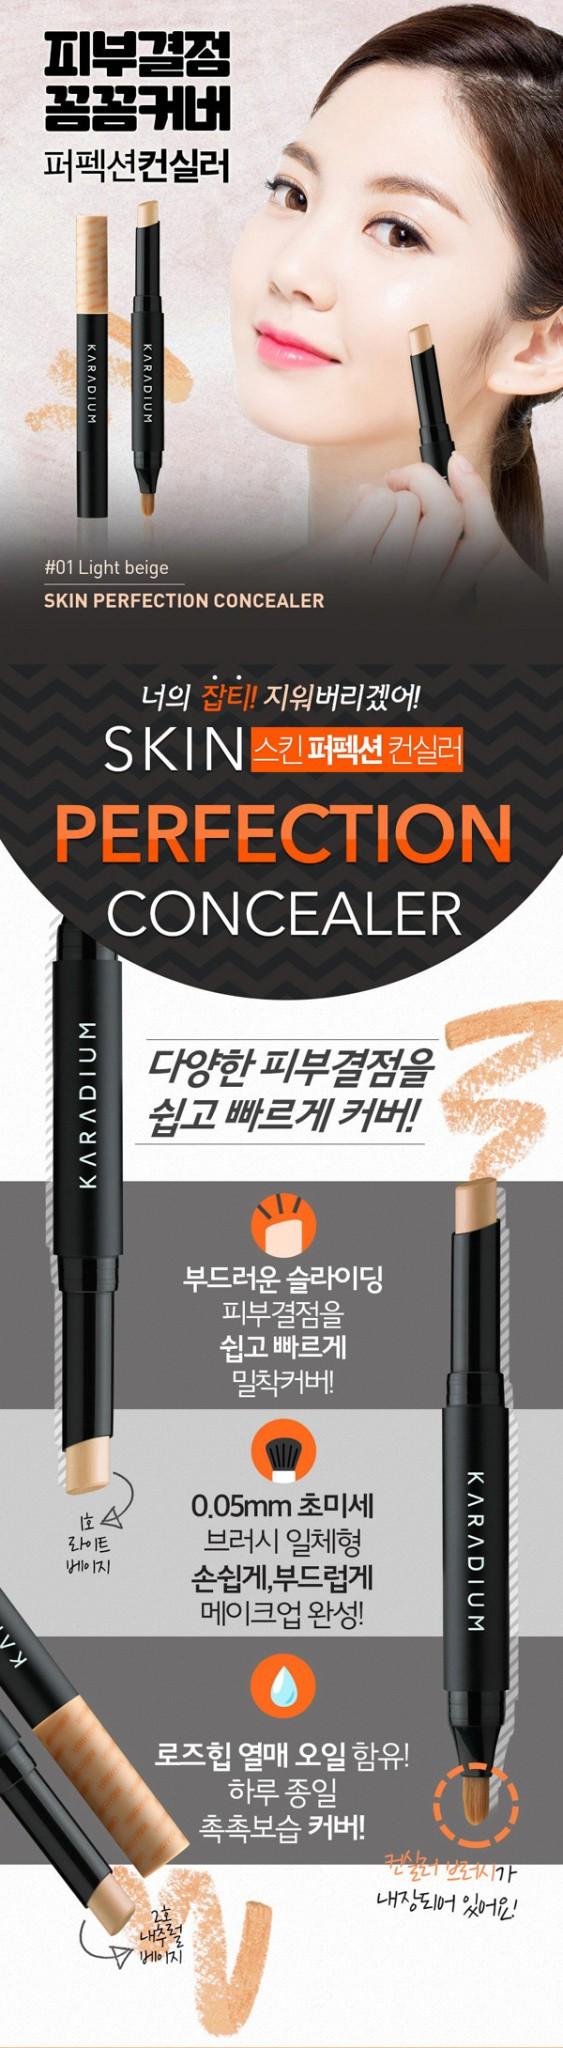 Che khuyet diem 2 dau Karadium skin perfection concealer (1)